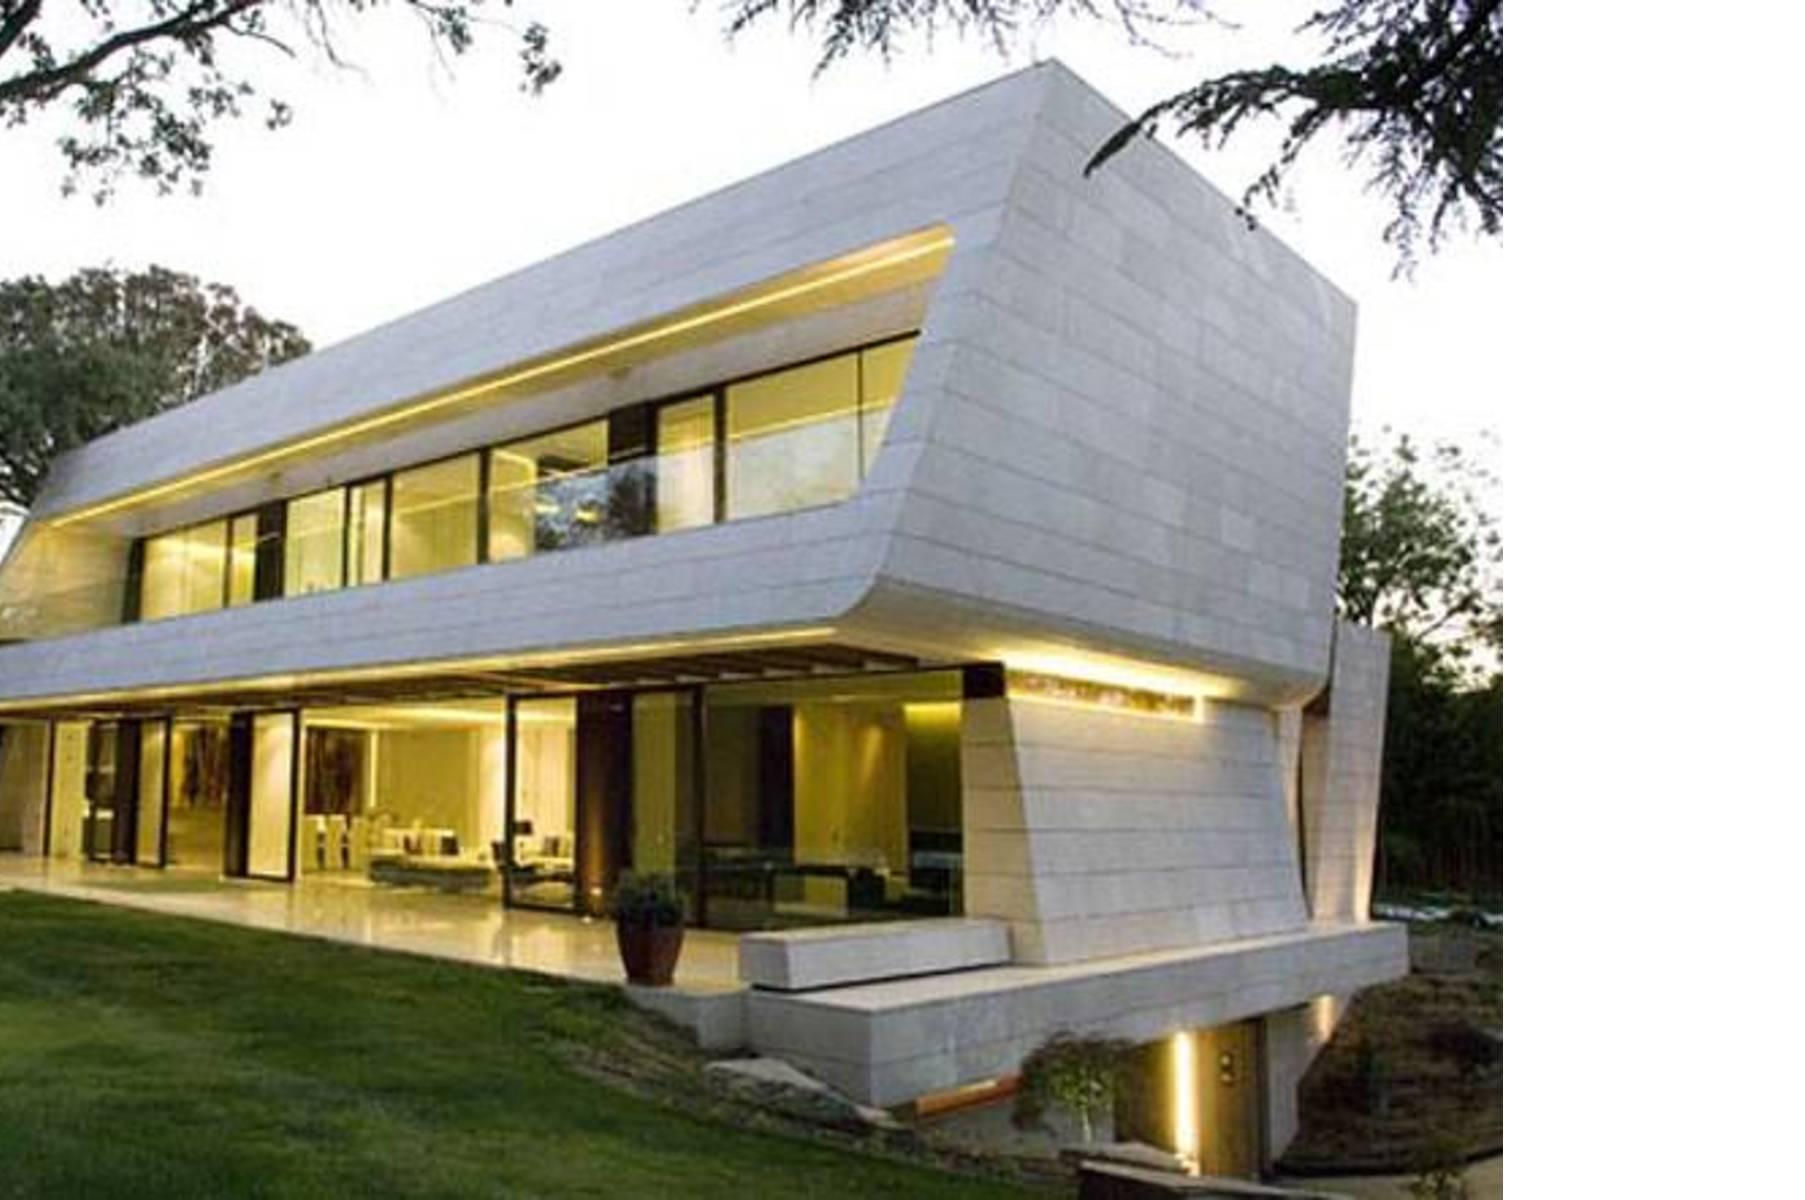 Acero residencia de marmol y bambu madrid floornature - Casa de bambu madrid ...